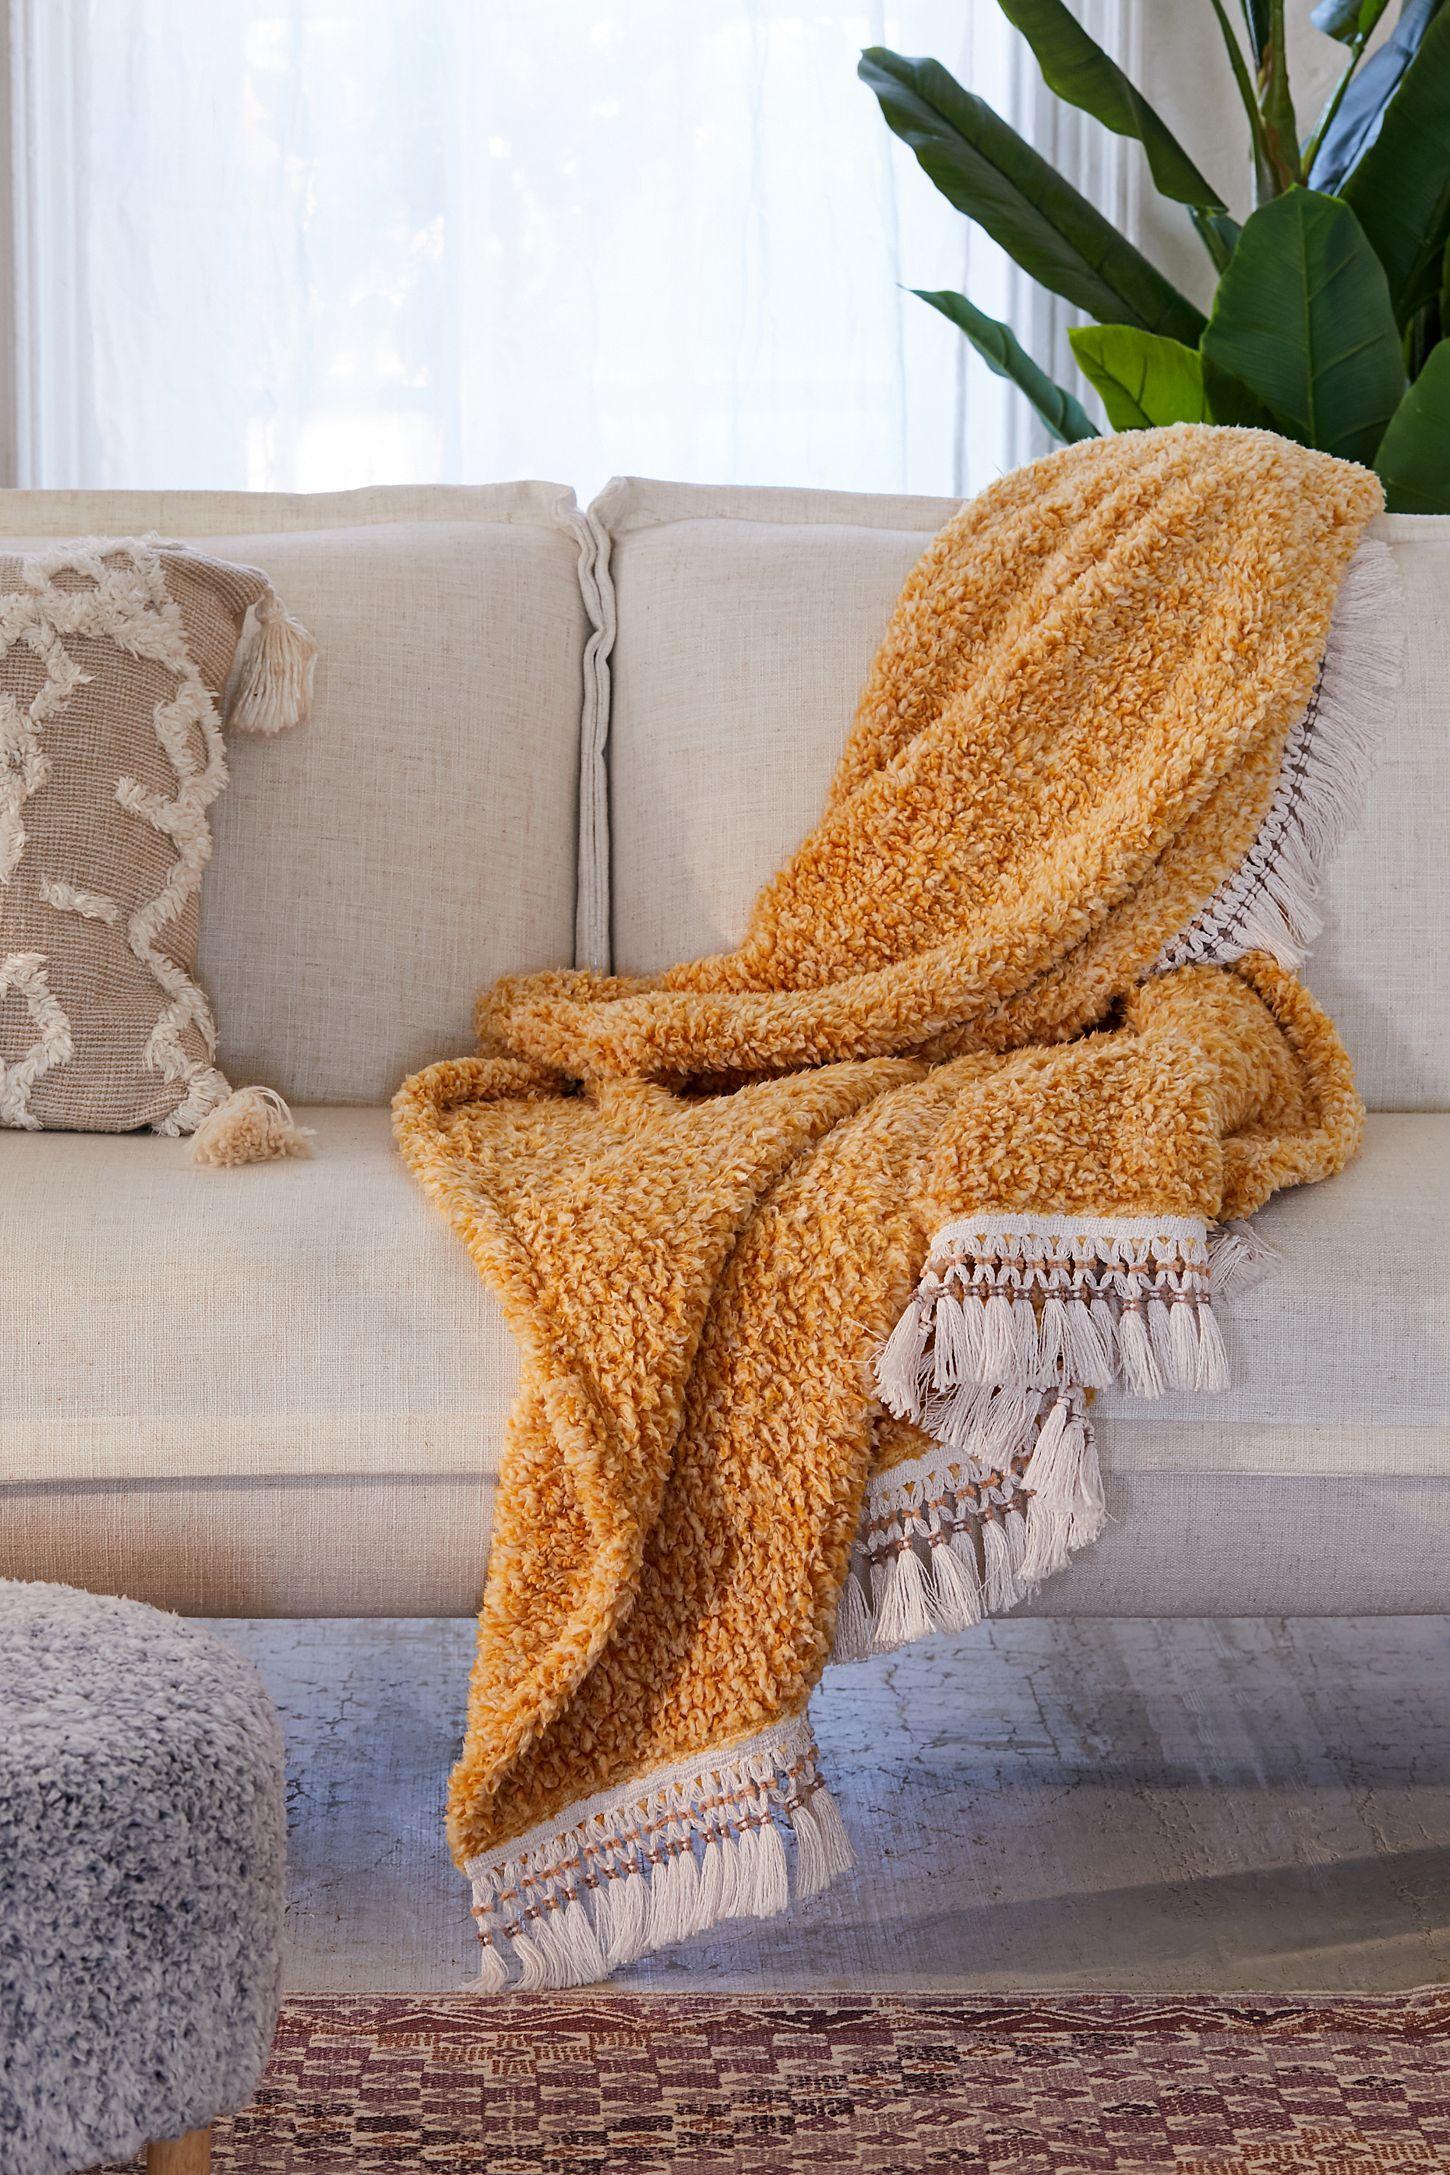 Amped Fleece Fringe Trim Throw Blanket Duvet Covers Urban Outfitters Throw Blanket Boho Throw Blanket